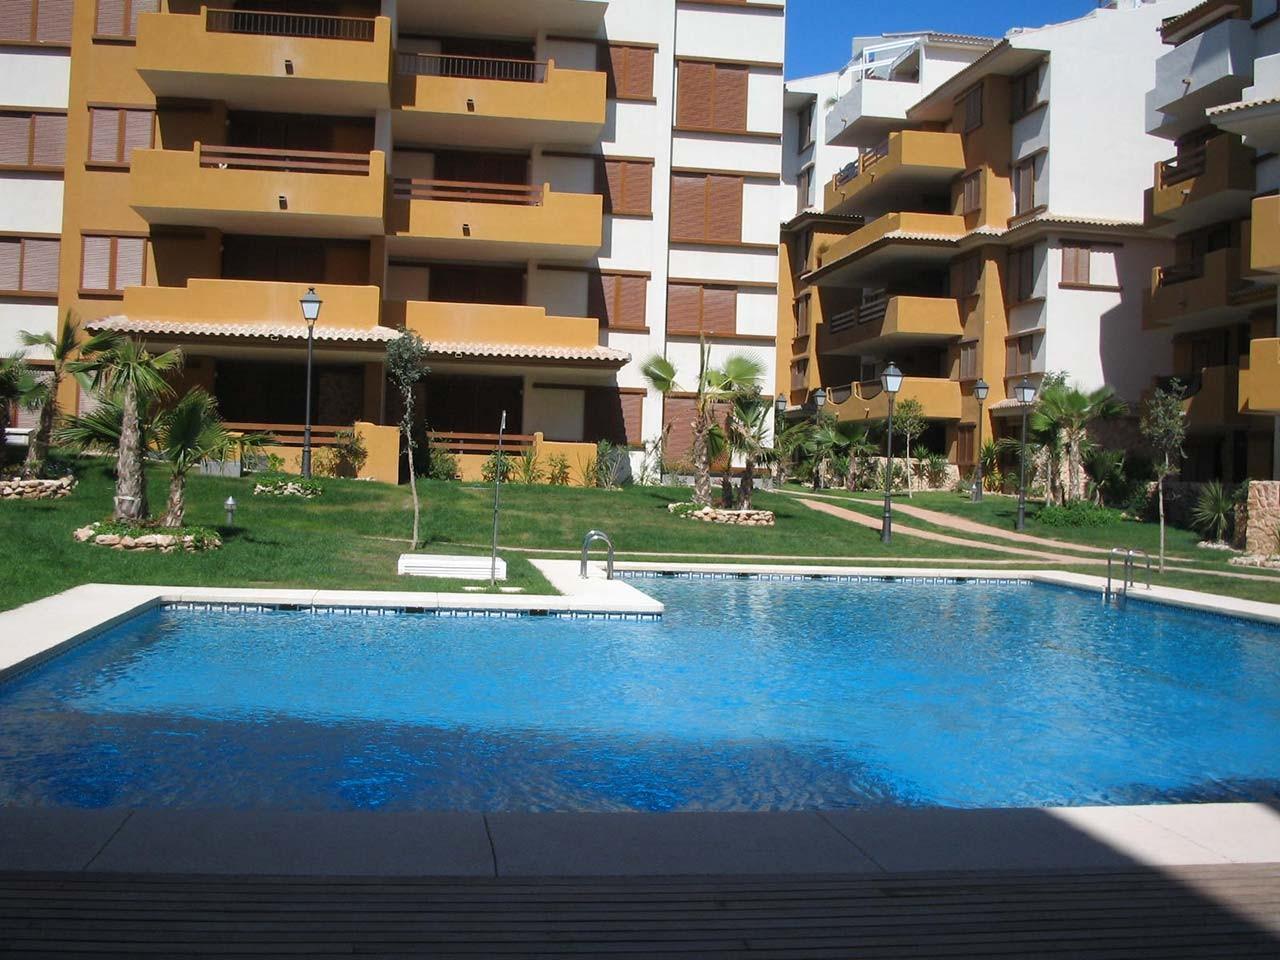 Фотогалерея Апартаменты в Пунта Прима, 2+1, 3+1